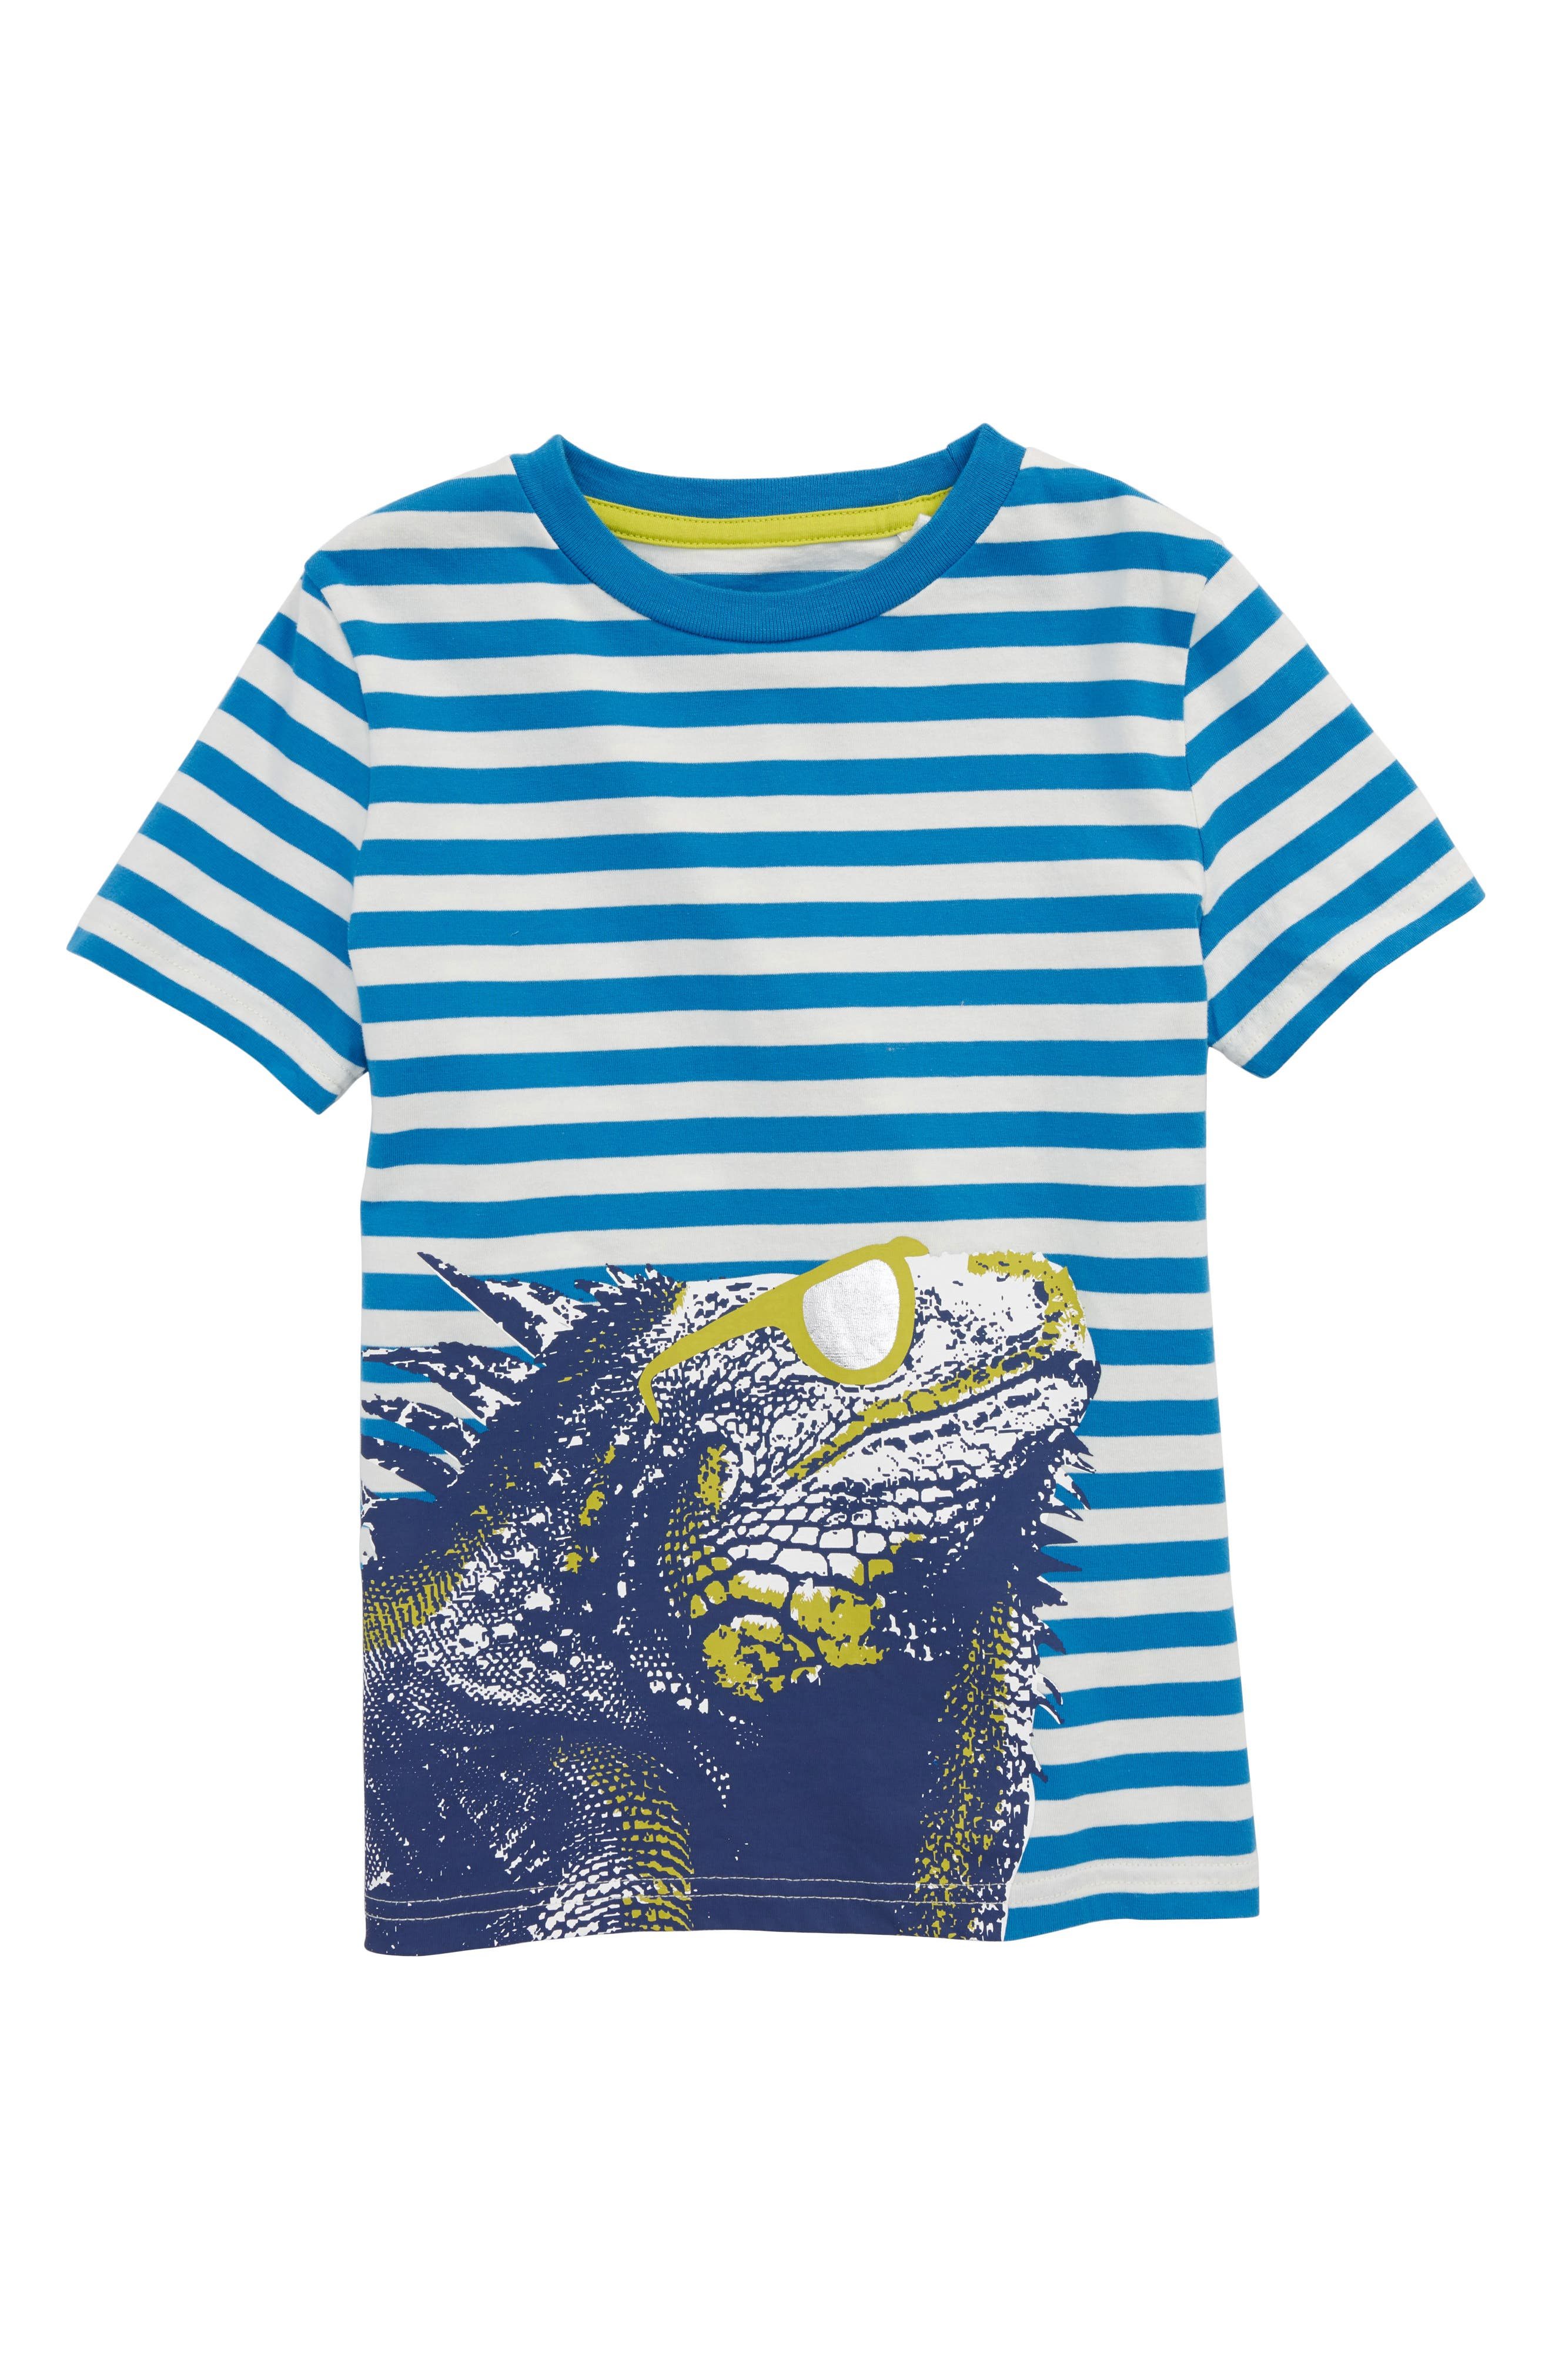 Arty Iguana T-Shirt,                             Main thumbnail 1, color,                             Yogo Blue/ Ecru Iguana